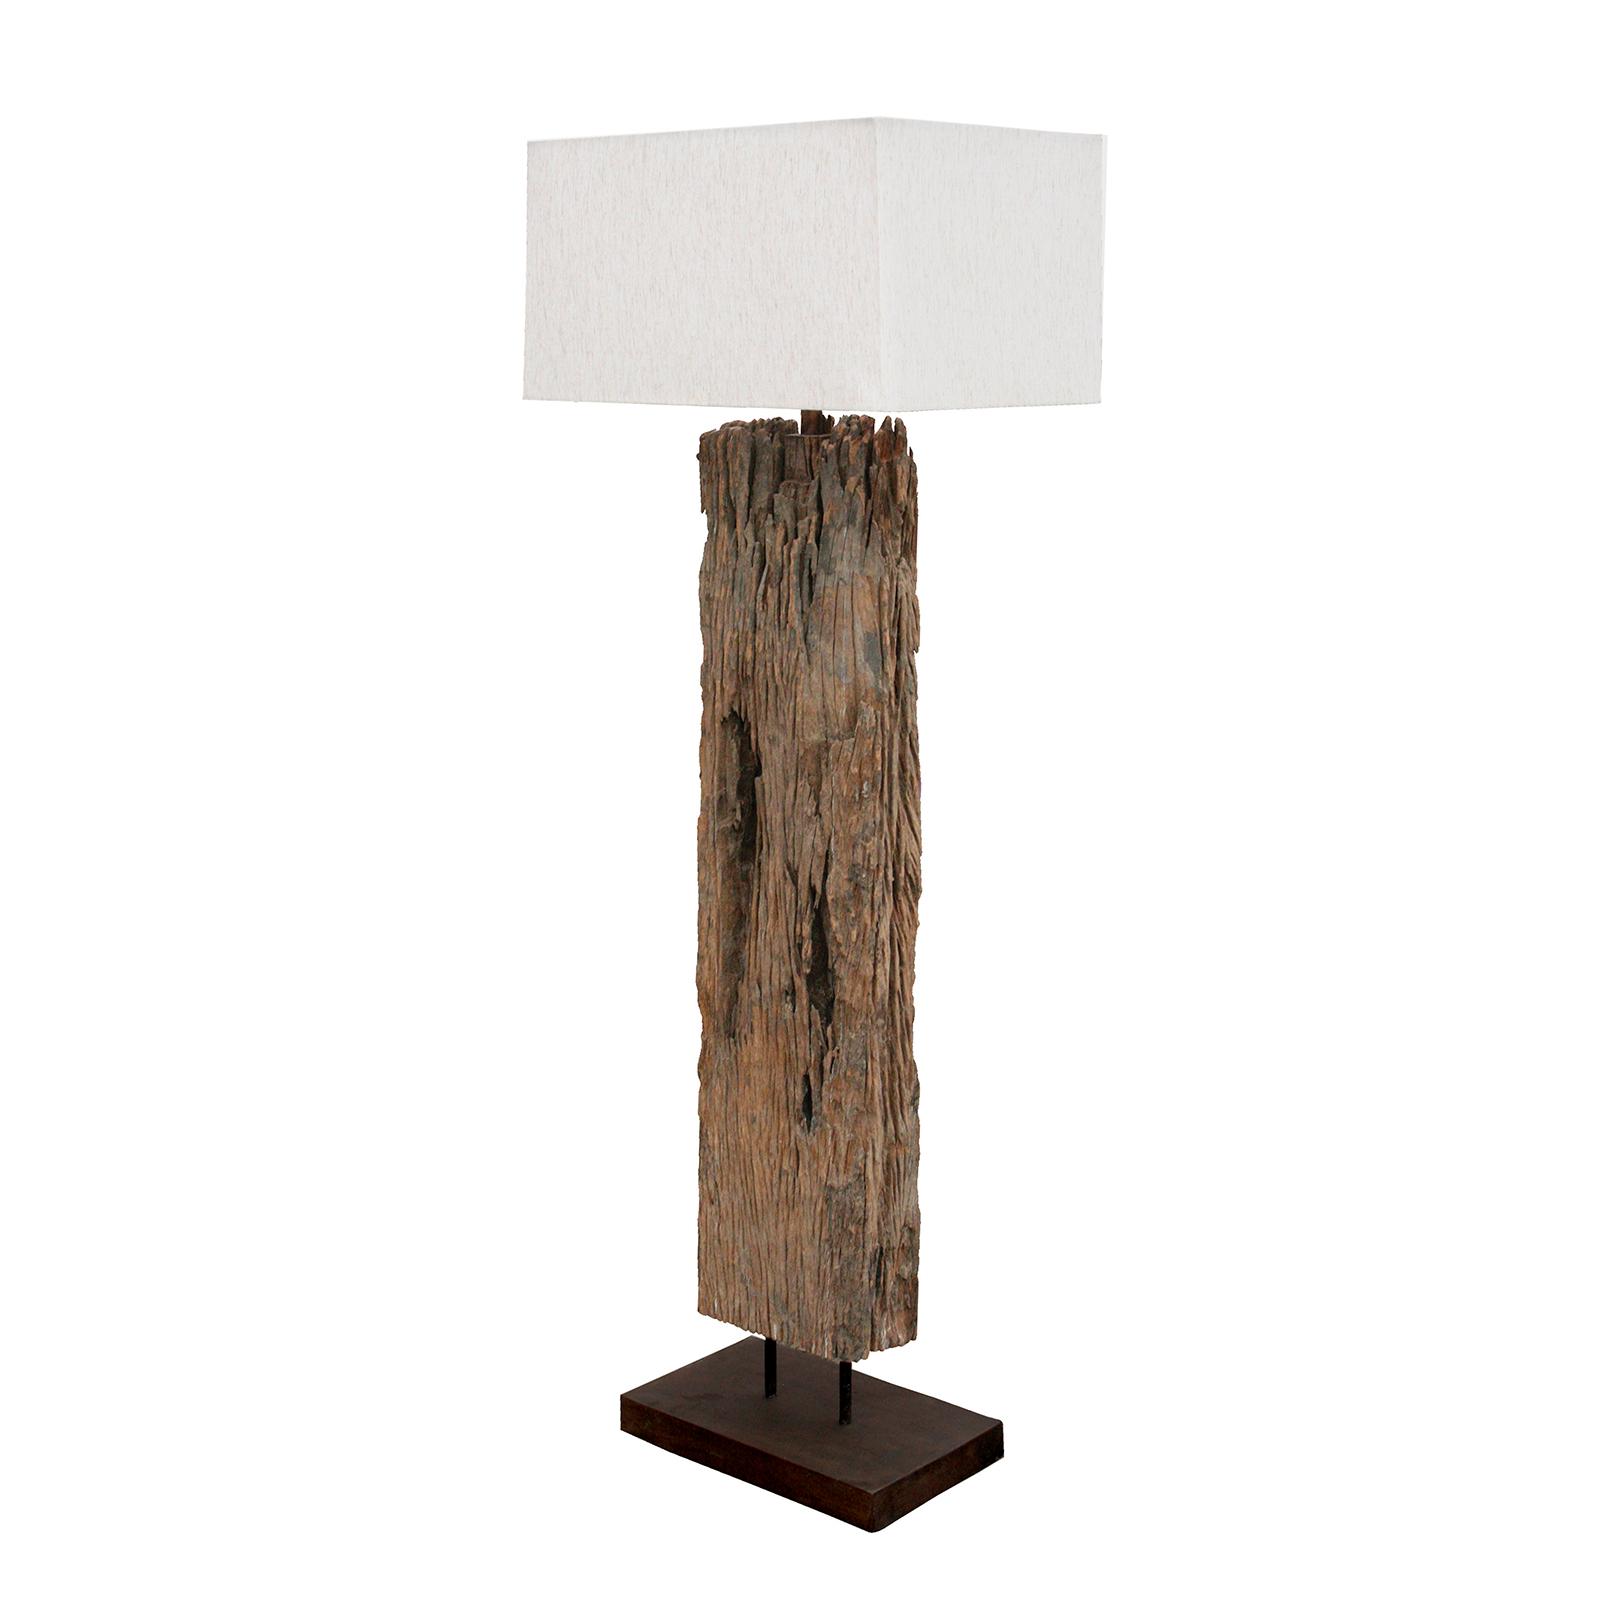 Reclaimed Wood Floor Lamp | Regina Andrew